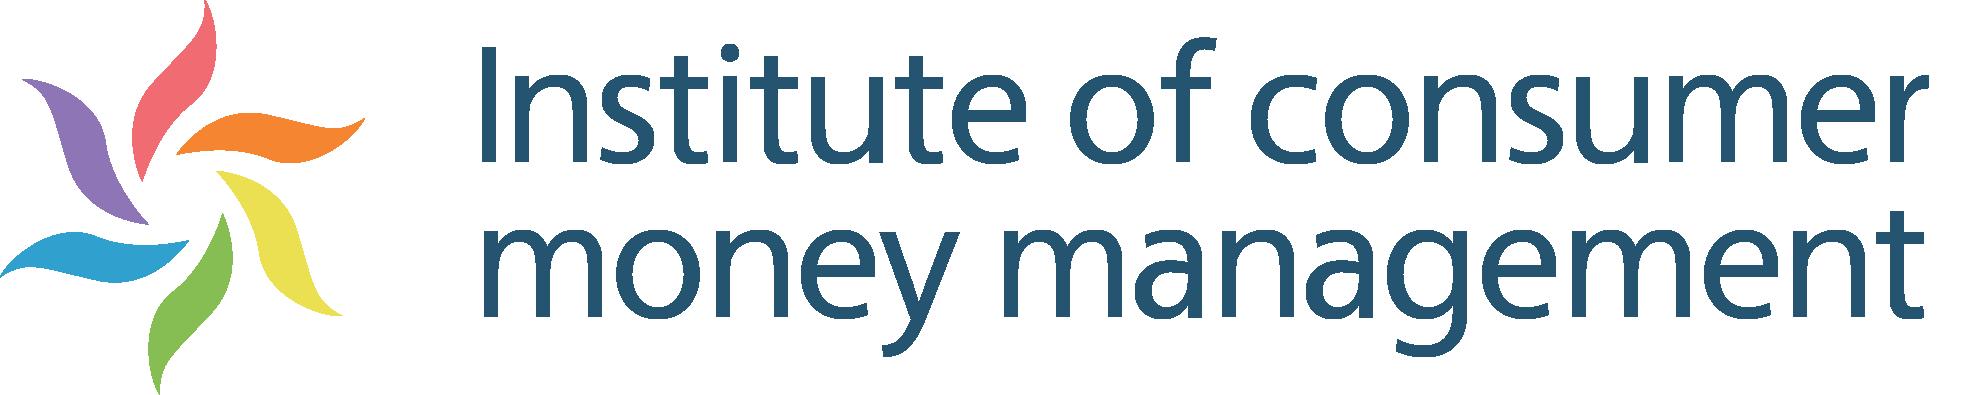 https://gflec.org/wp-content/uploads/2019/11/ICMM_logo.png